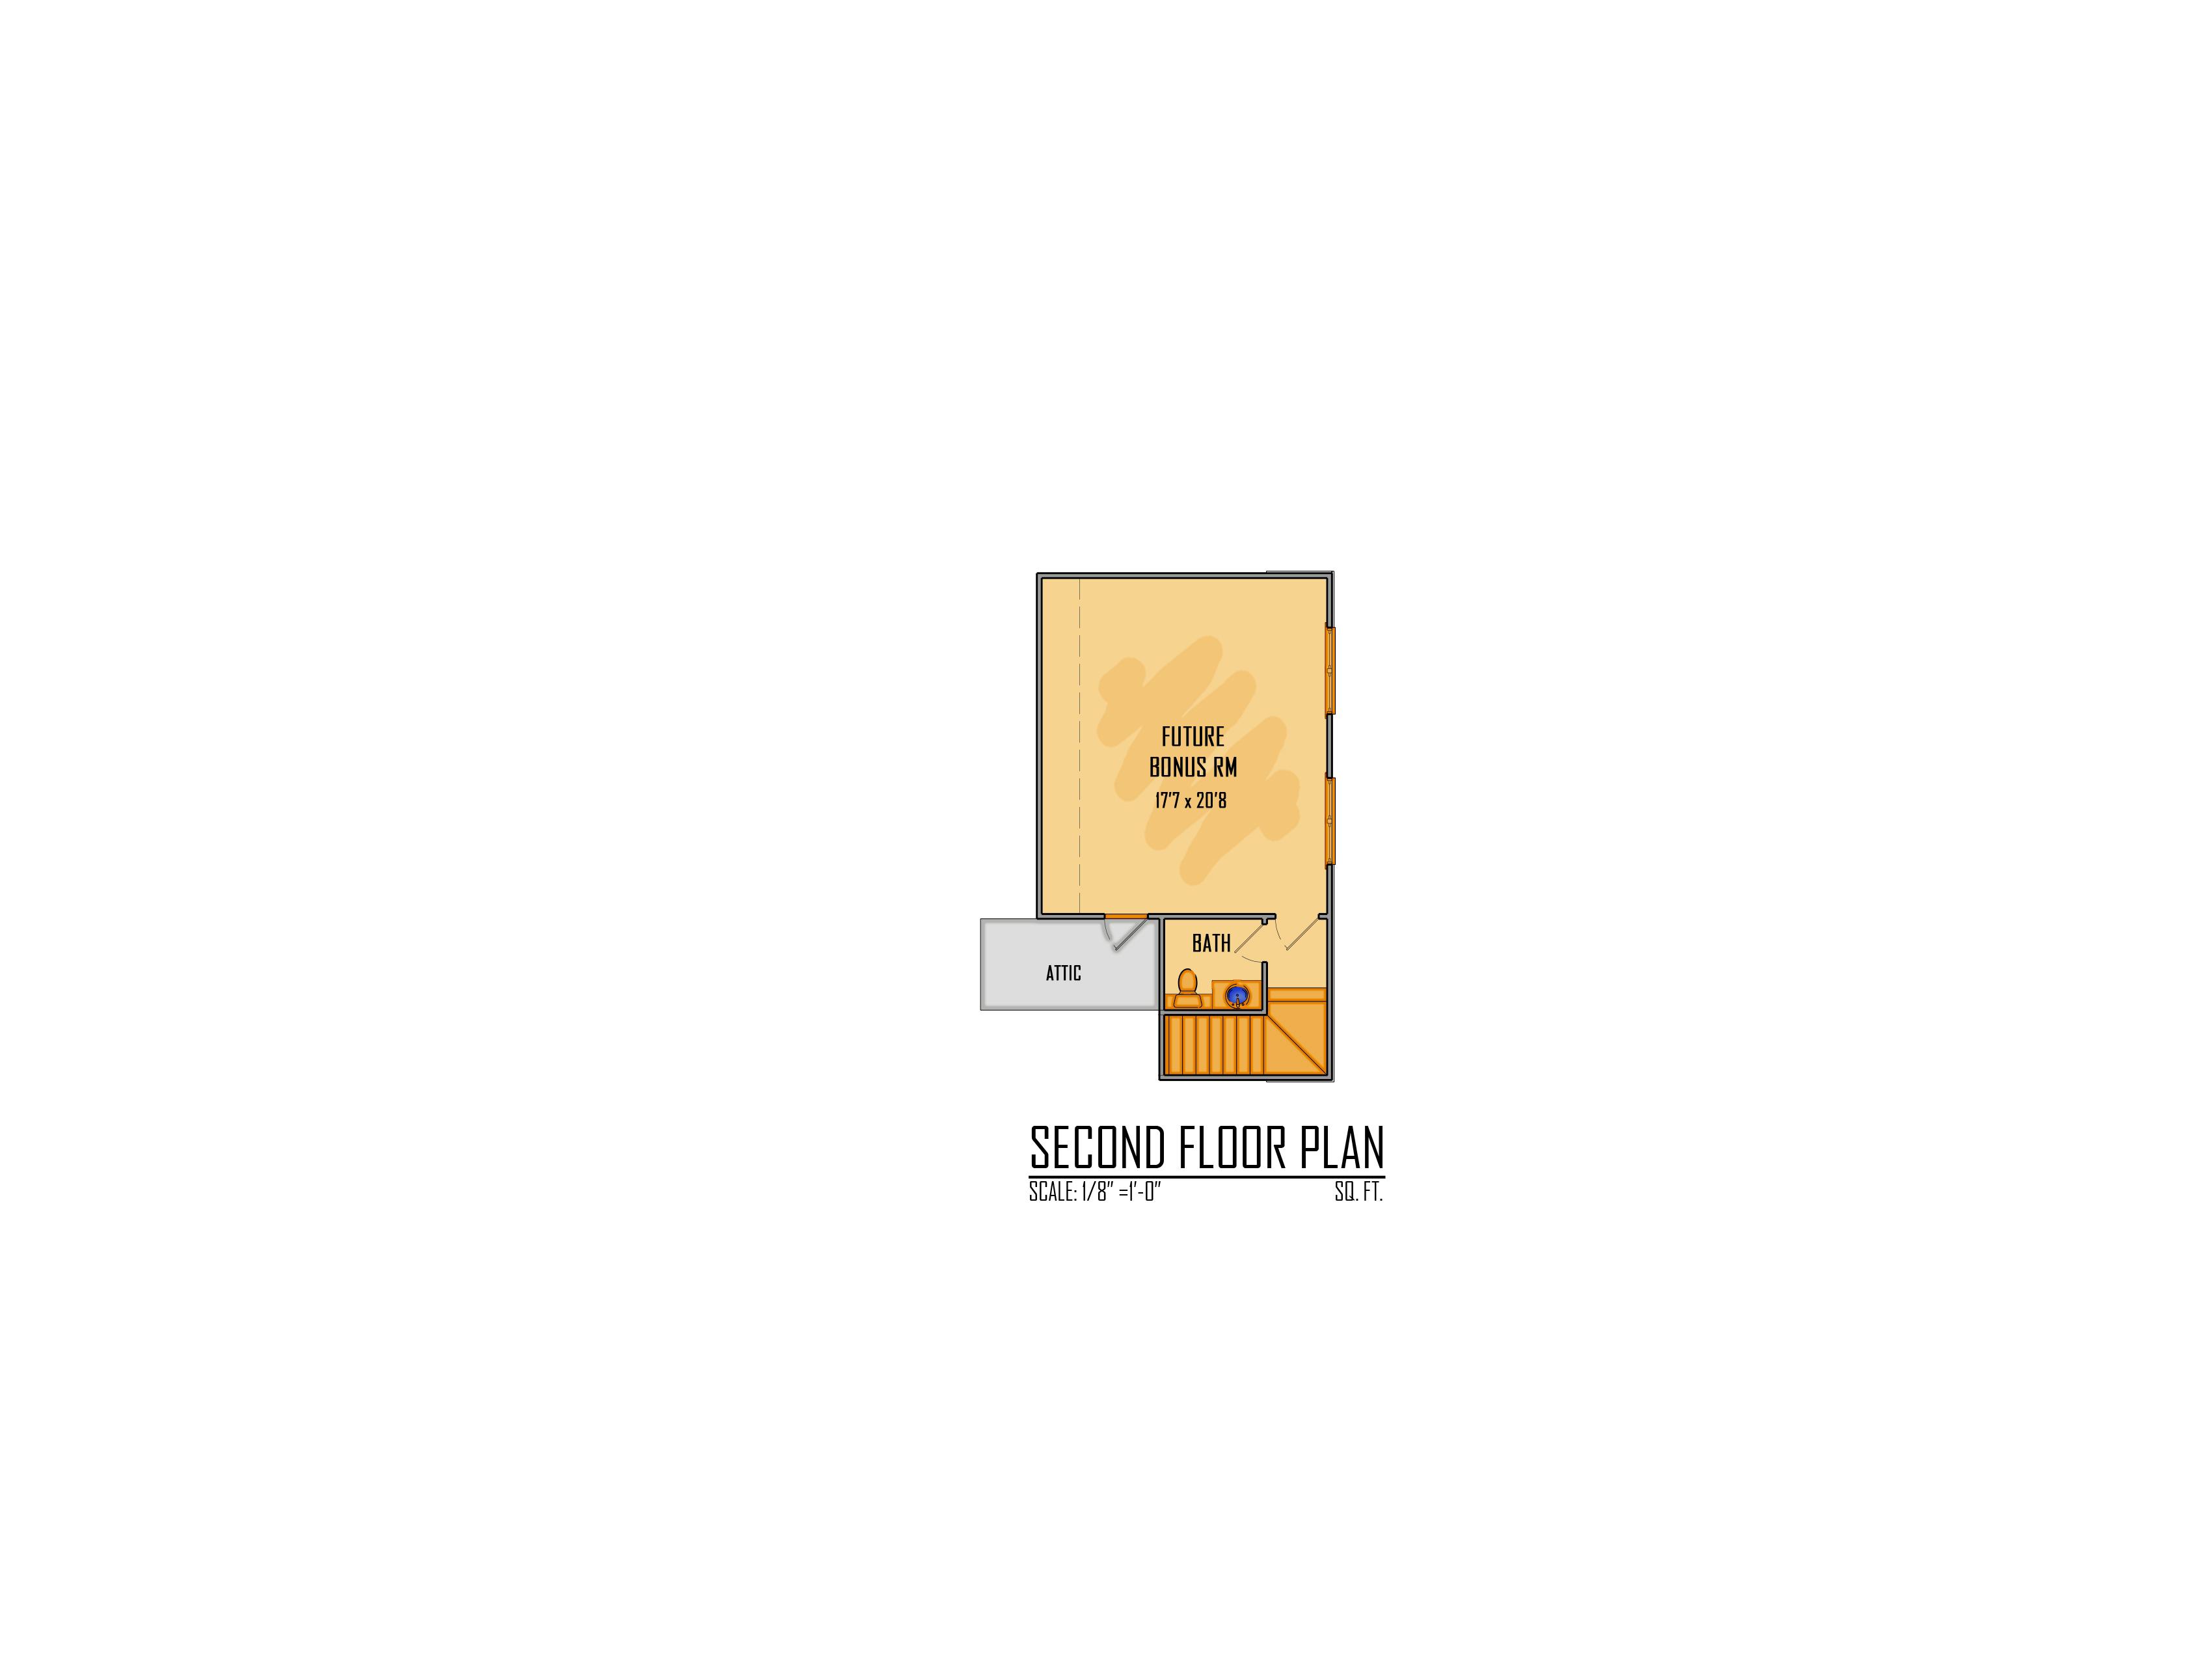 61-18 2nd Floor Rendering